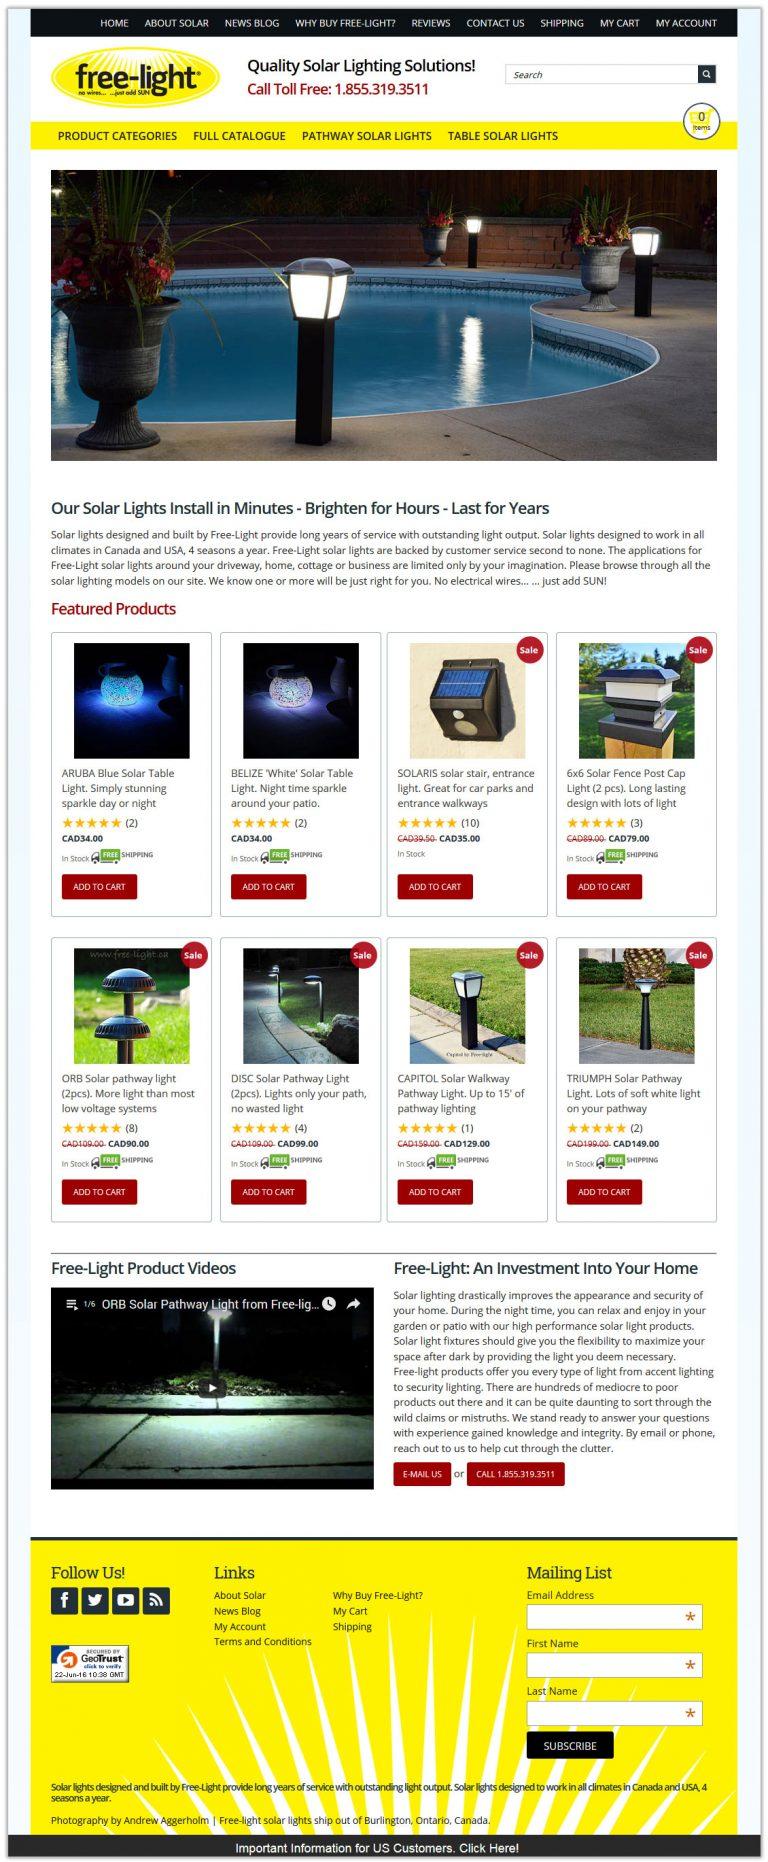 free-light tall website layout